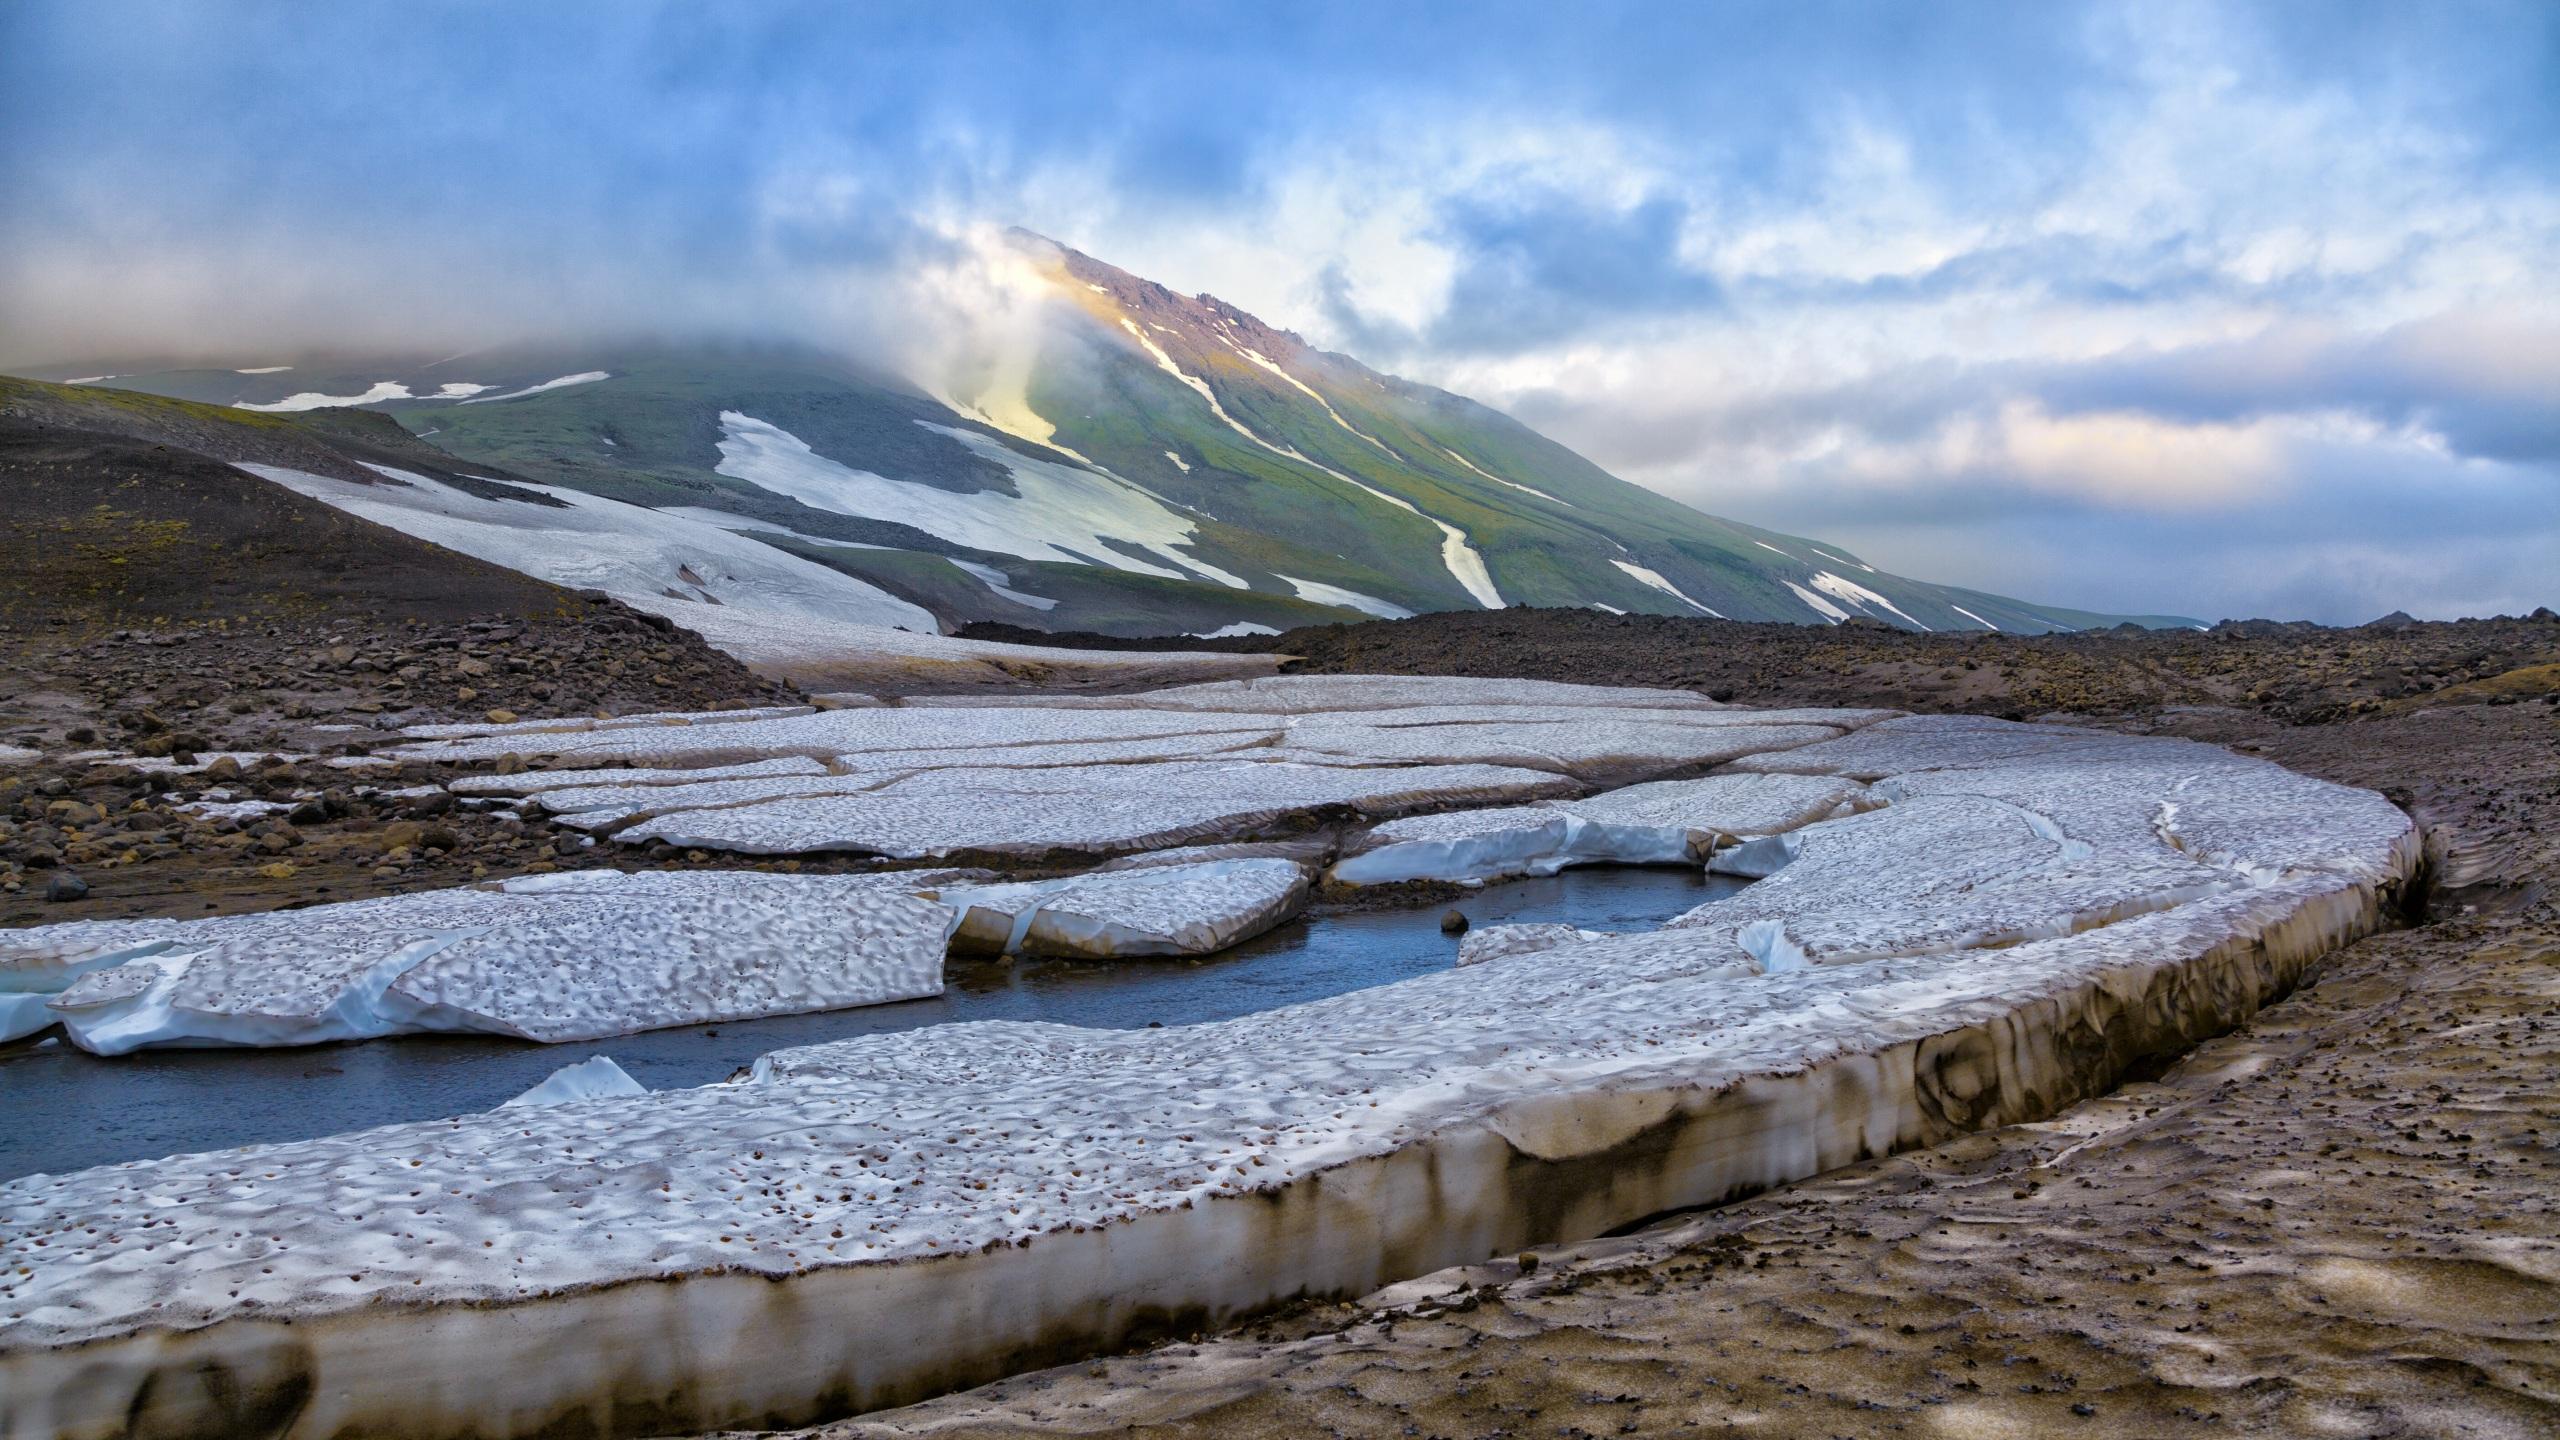 Photos Kamchatka Peninsula Russia Ice Mountains Cities 2560x1440